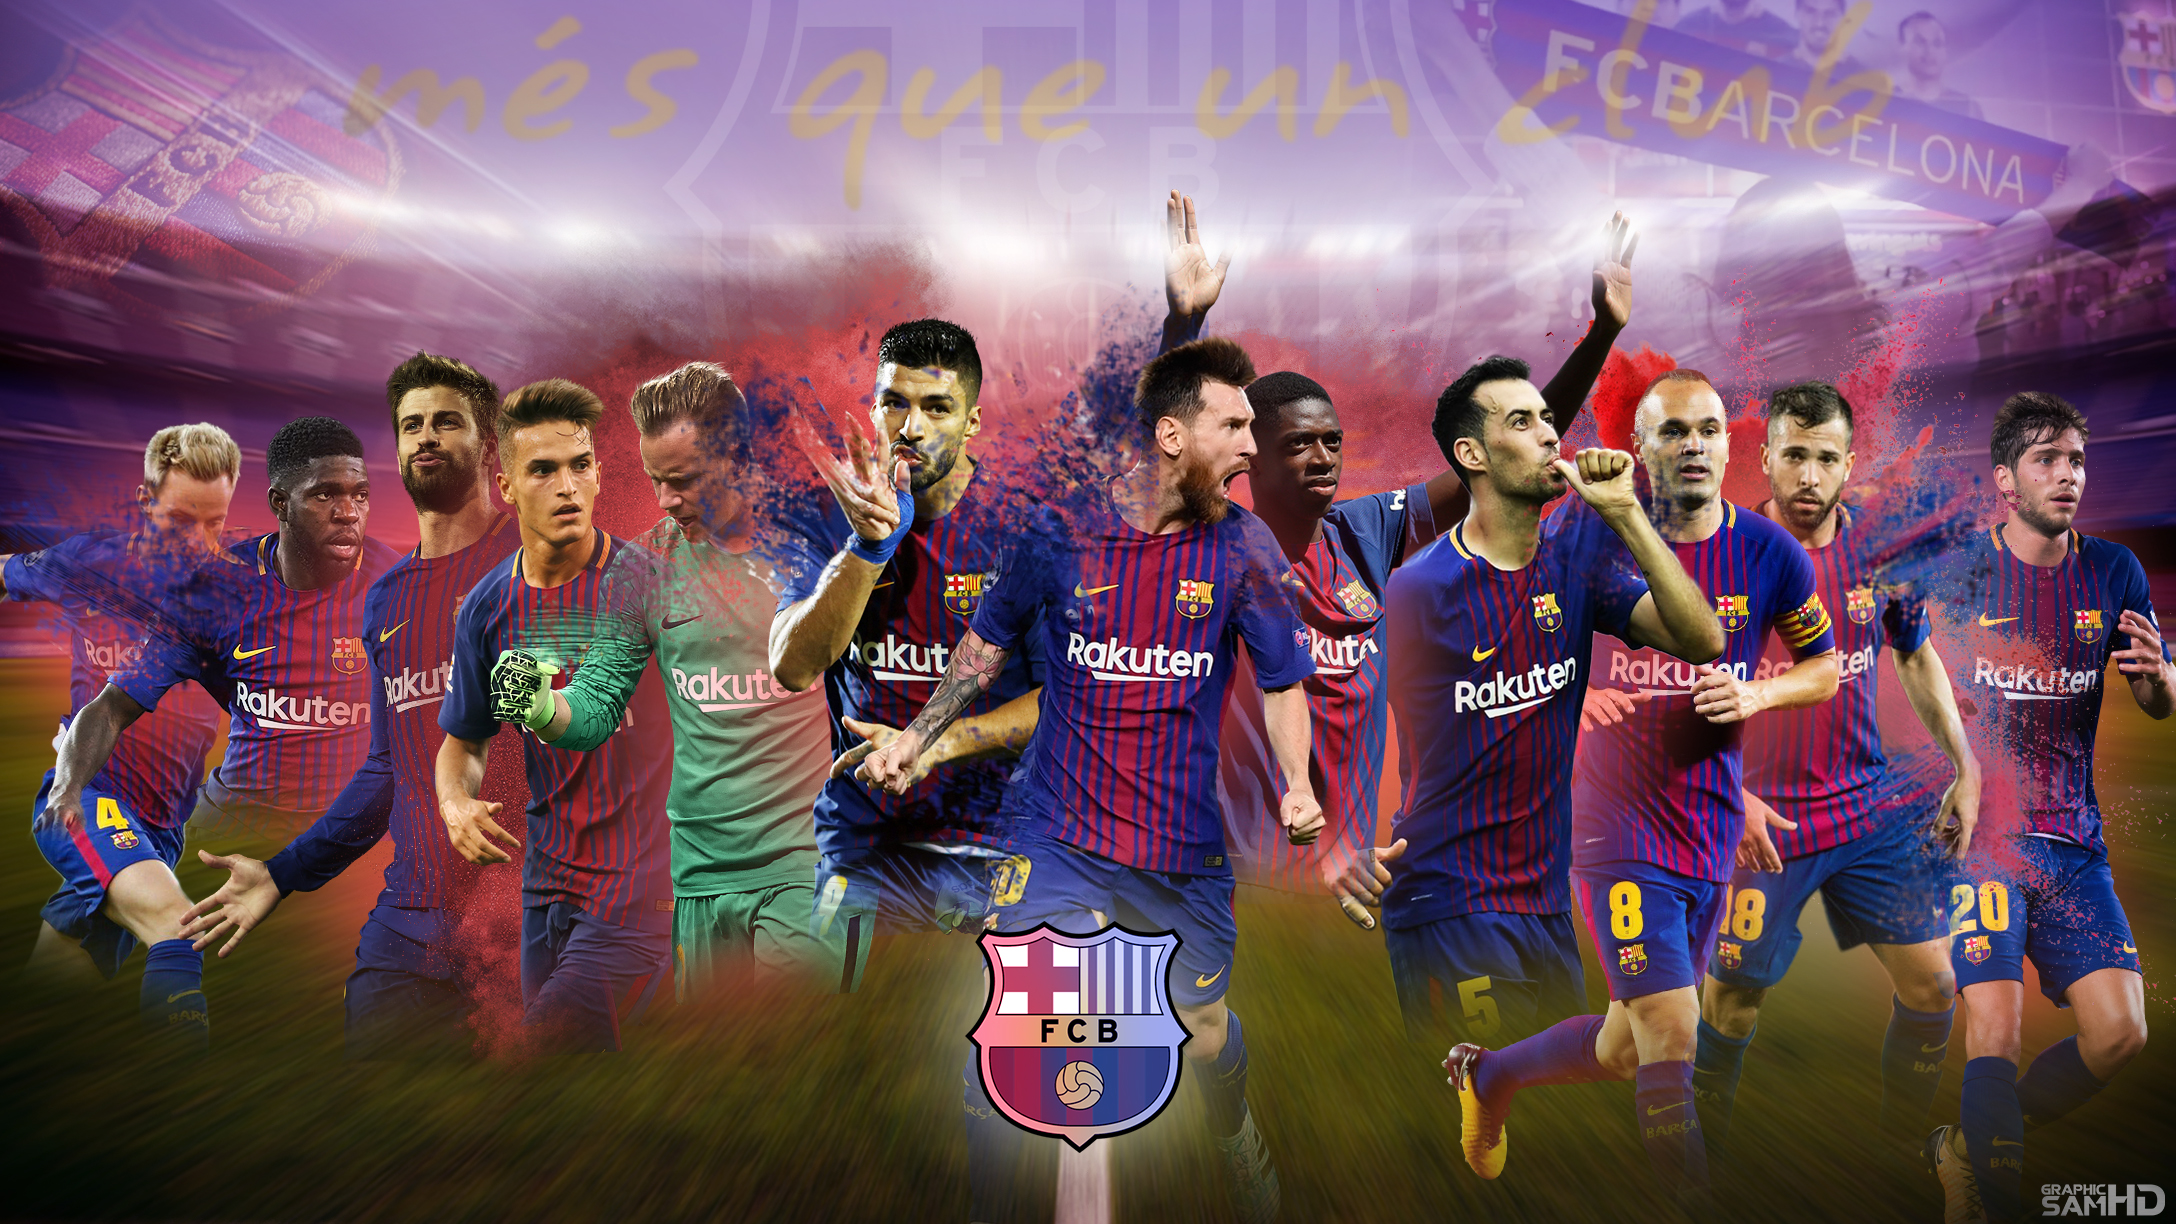 Fc Barcelona Desktop Wallpaper 20172018 By Graphicsamhd On